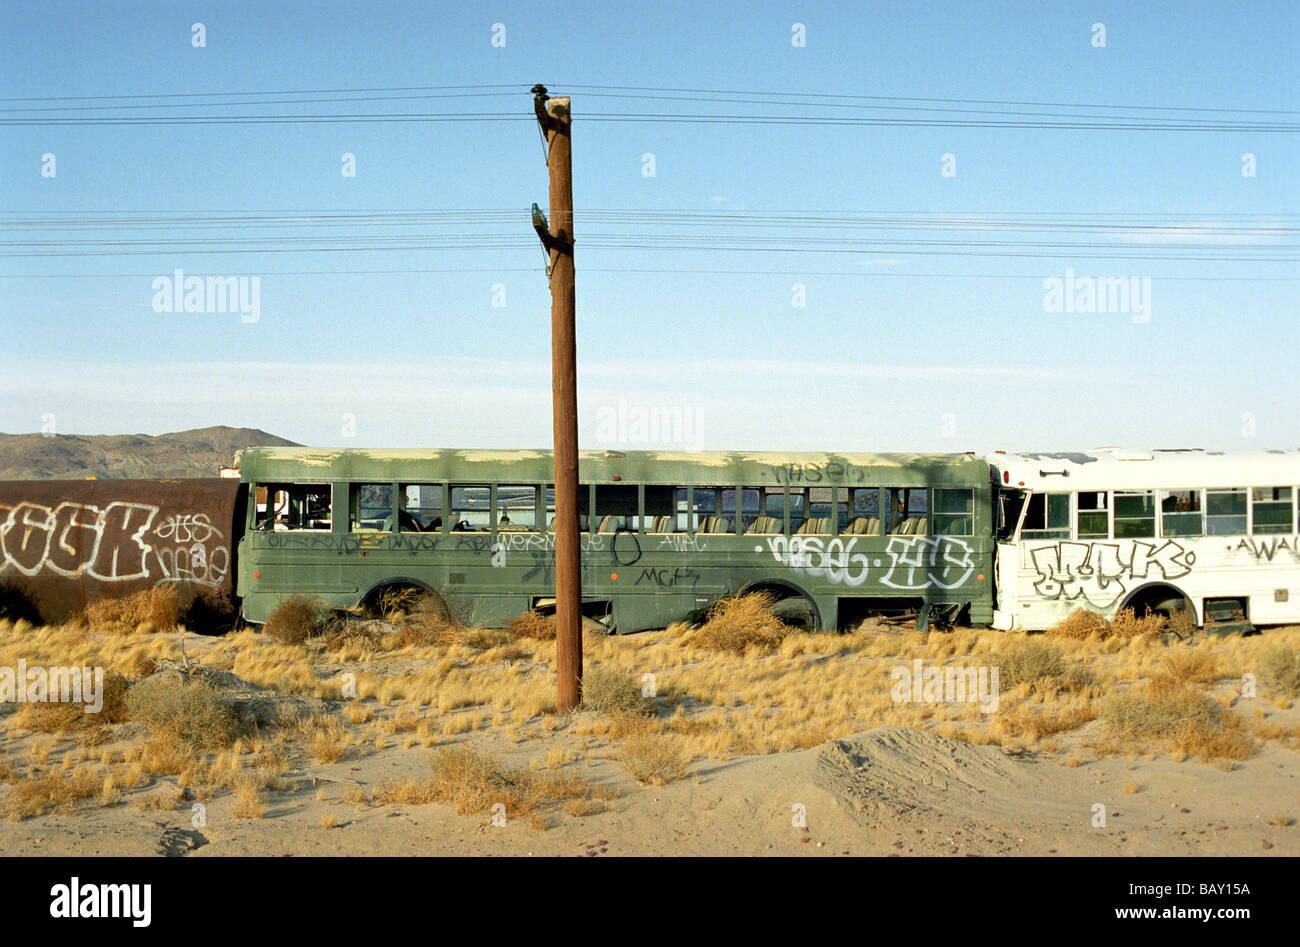 Old buses on a scrap yard, Mojave Desert, California, USA - Stock Image